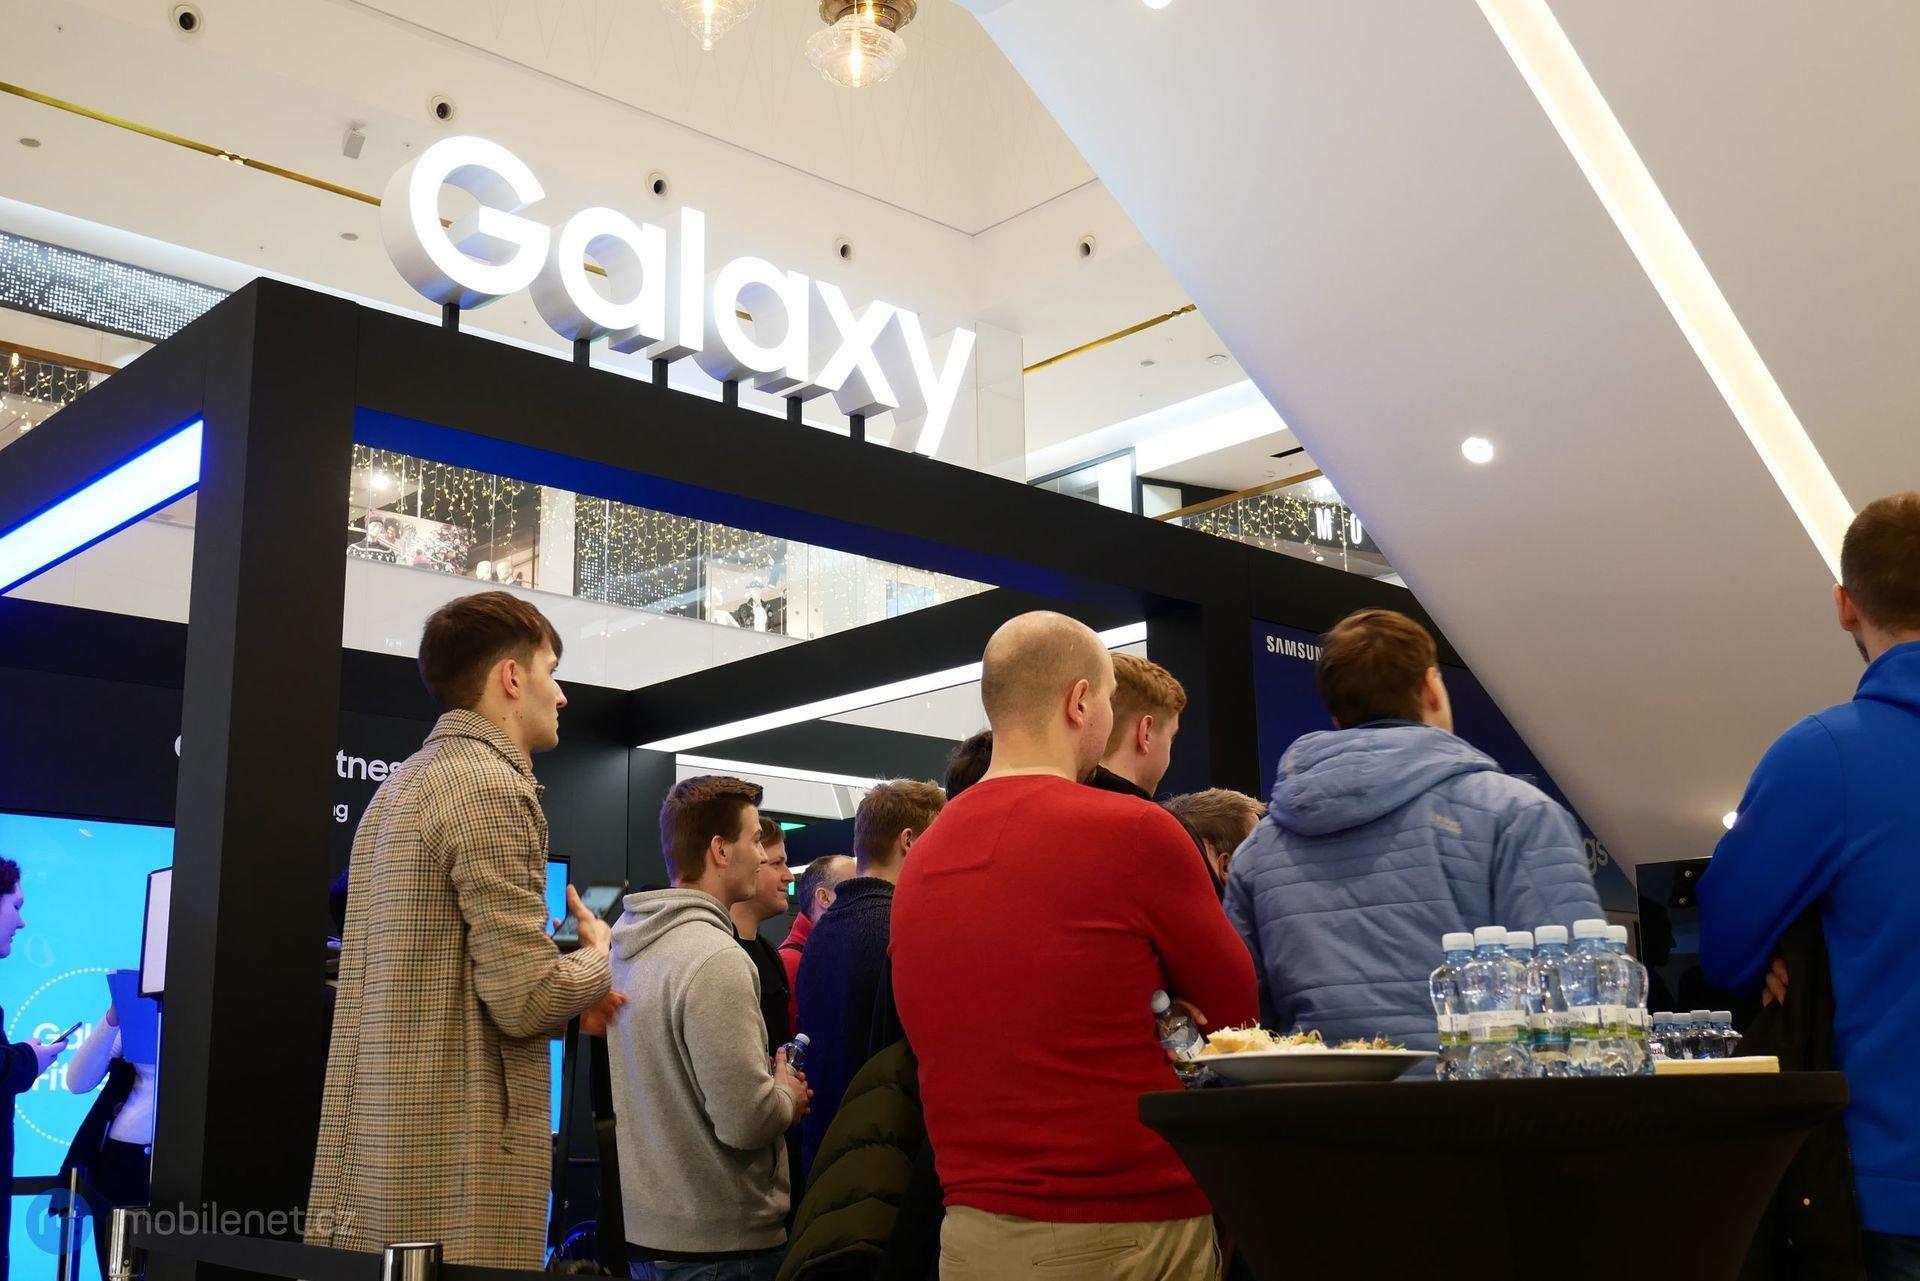 Samsung Galaxy Studio & mobilenet.cz meetup